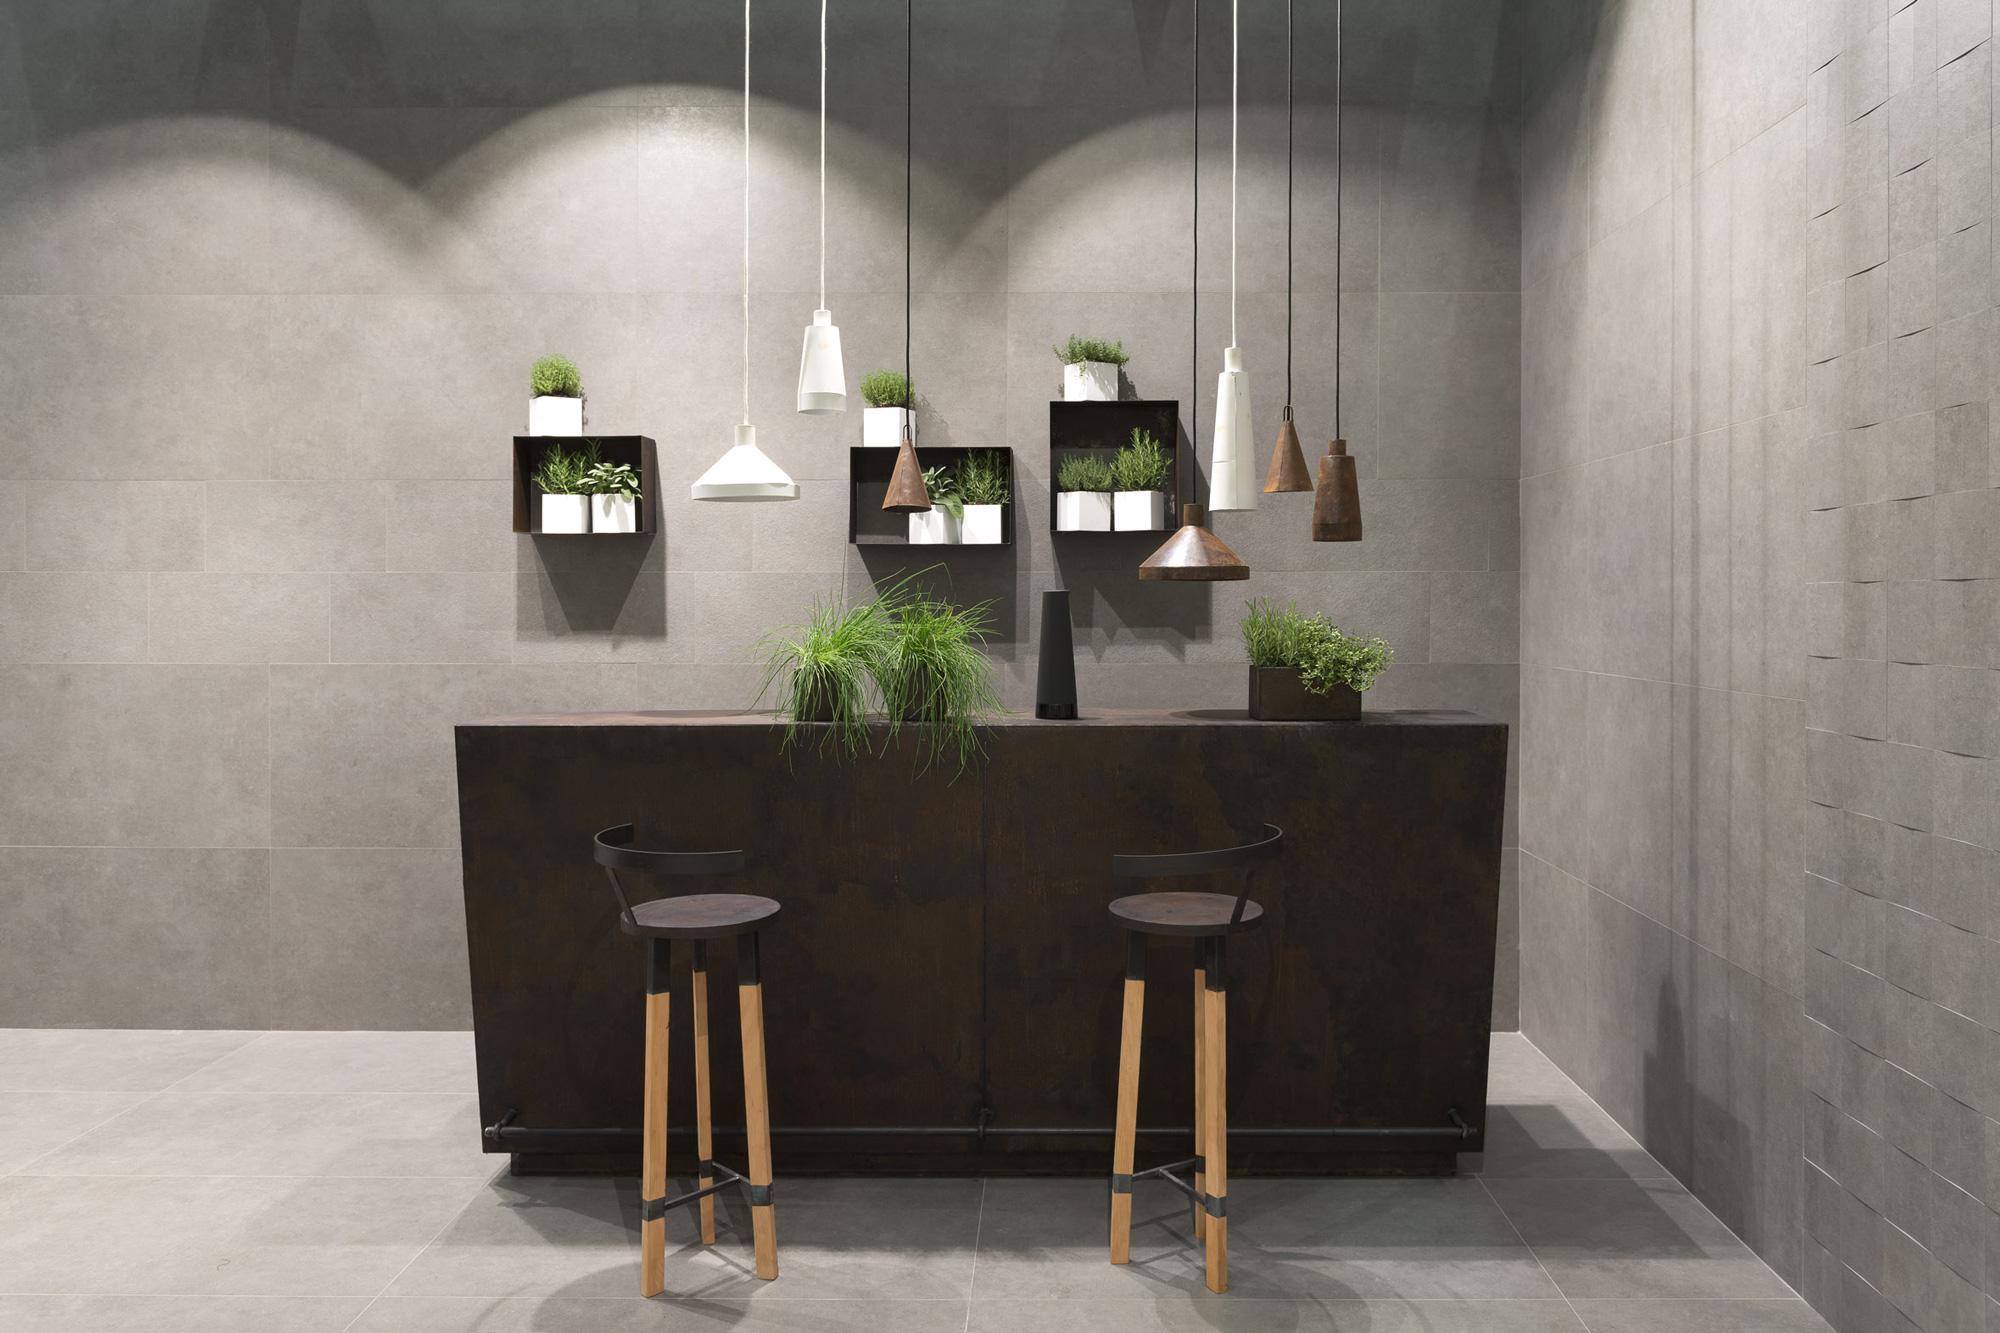 cersaie 2014 for marazzi group uainot. Black Bedroom Furniture Sets. Home Design Ideas